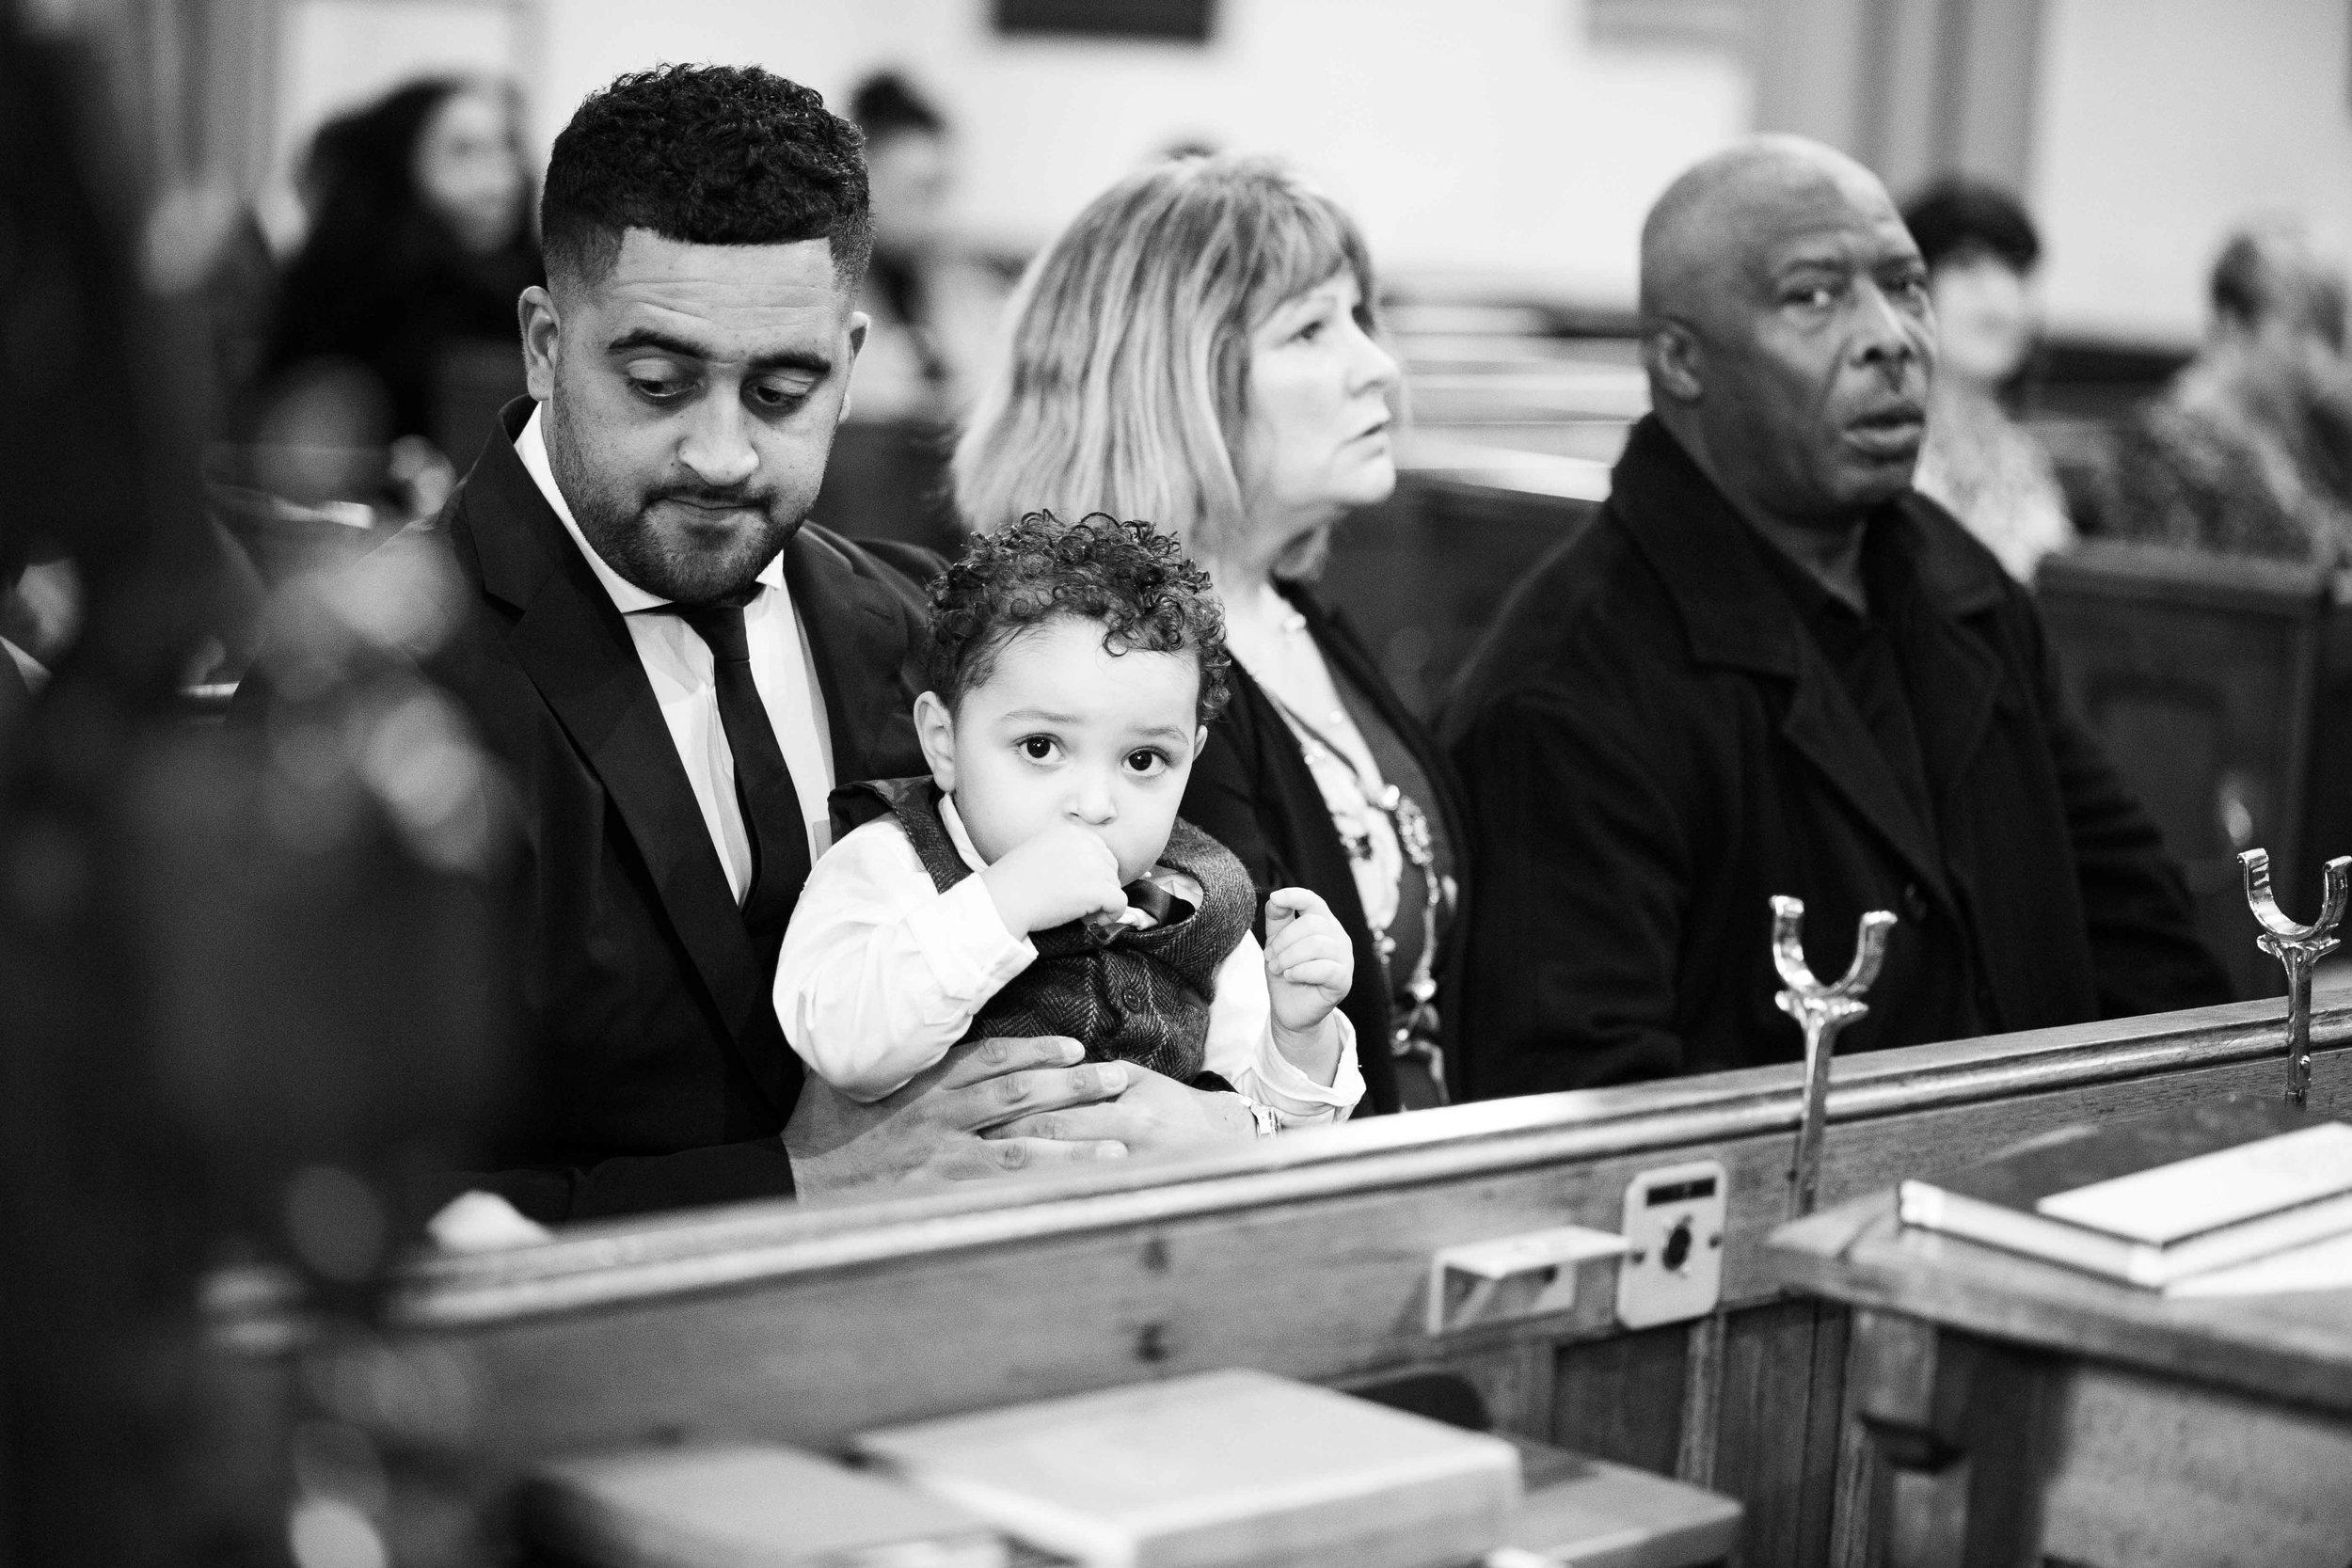 Lea-cooper-photography-christening-photographer-baptism-wolverhampton-wednesbury-walsall-willenhall-dudley-church-chapel-event-photography-15.jpg